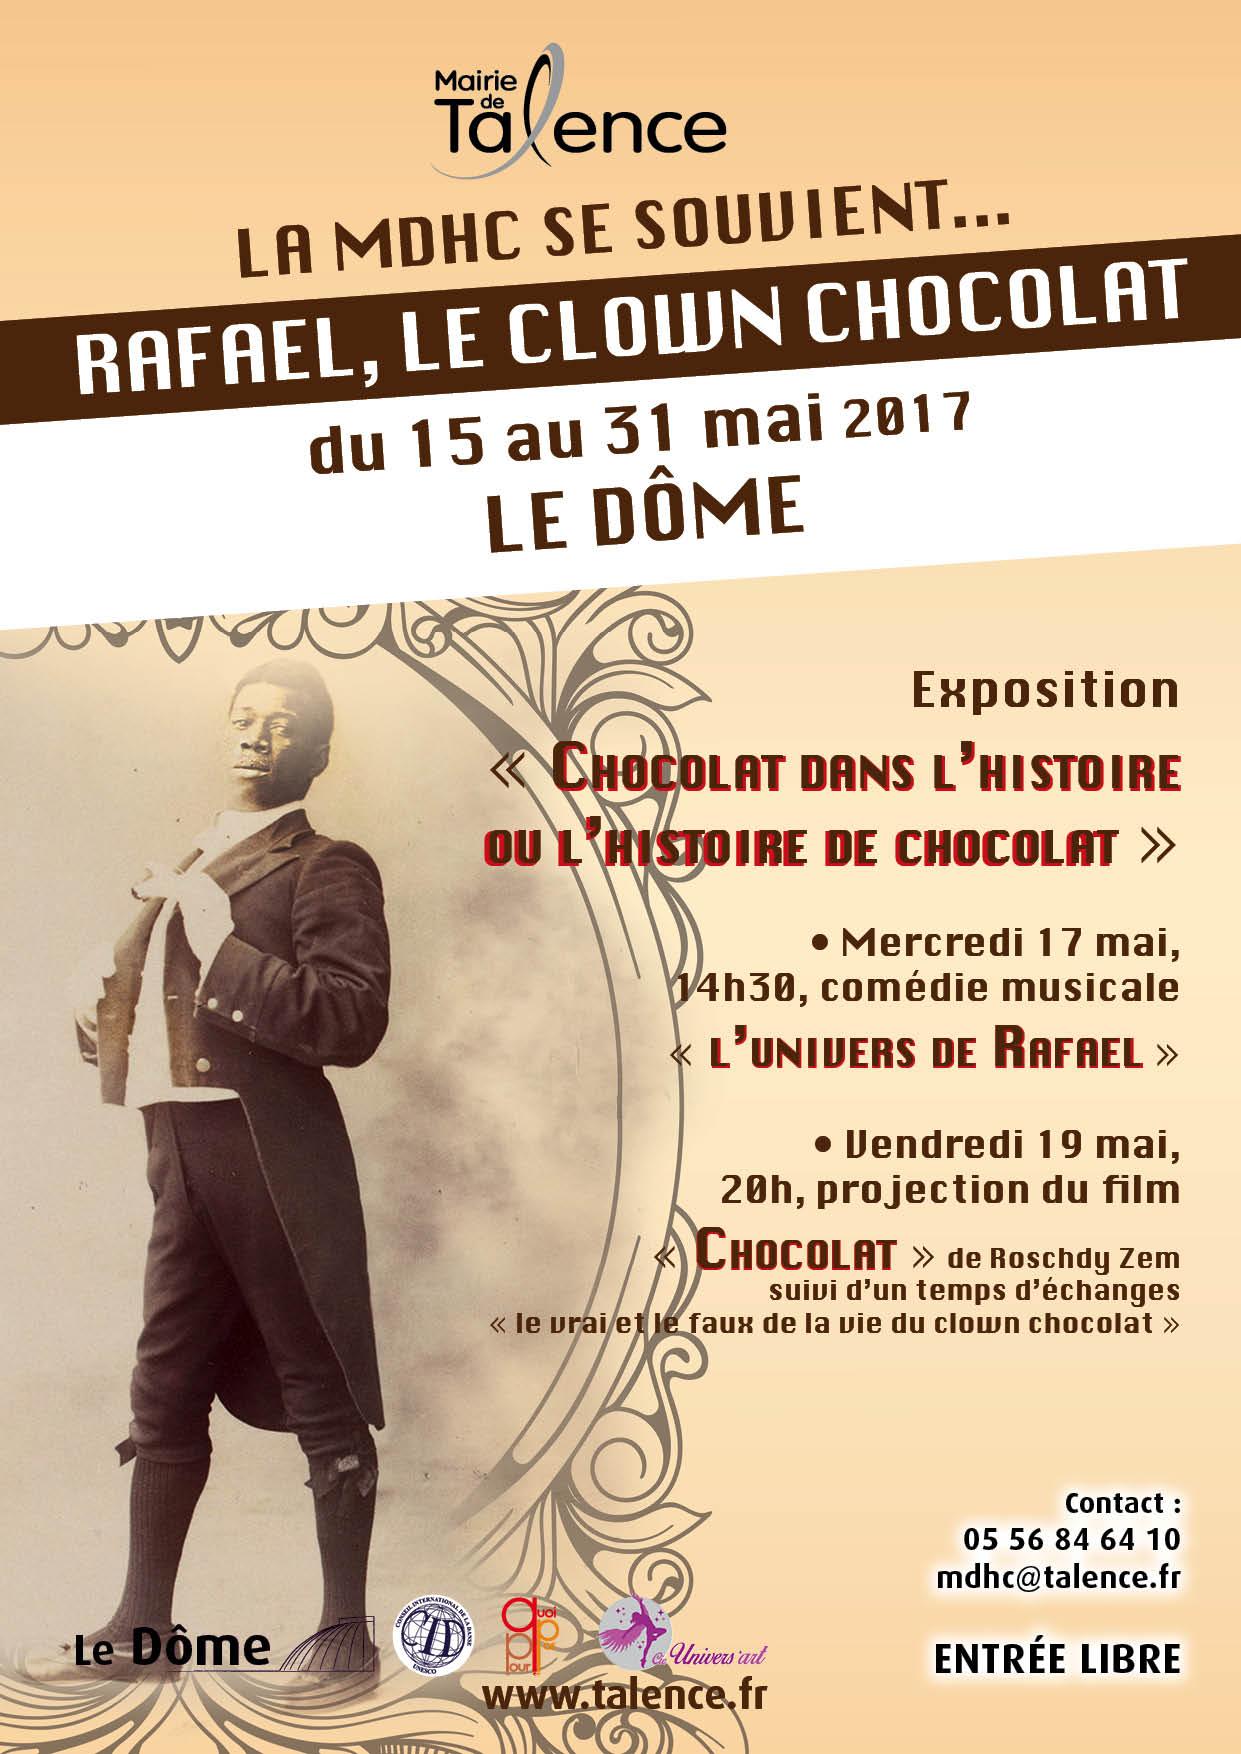 Le Clown Chocolat Au Dôme De Talence Du 15 Au 31 Mai